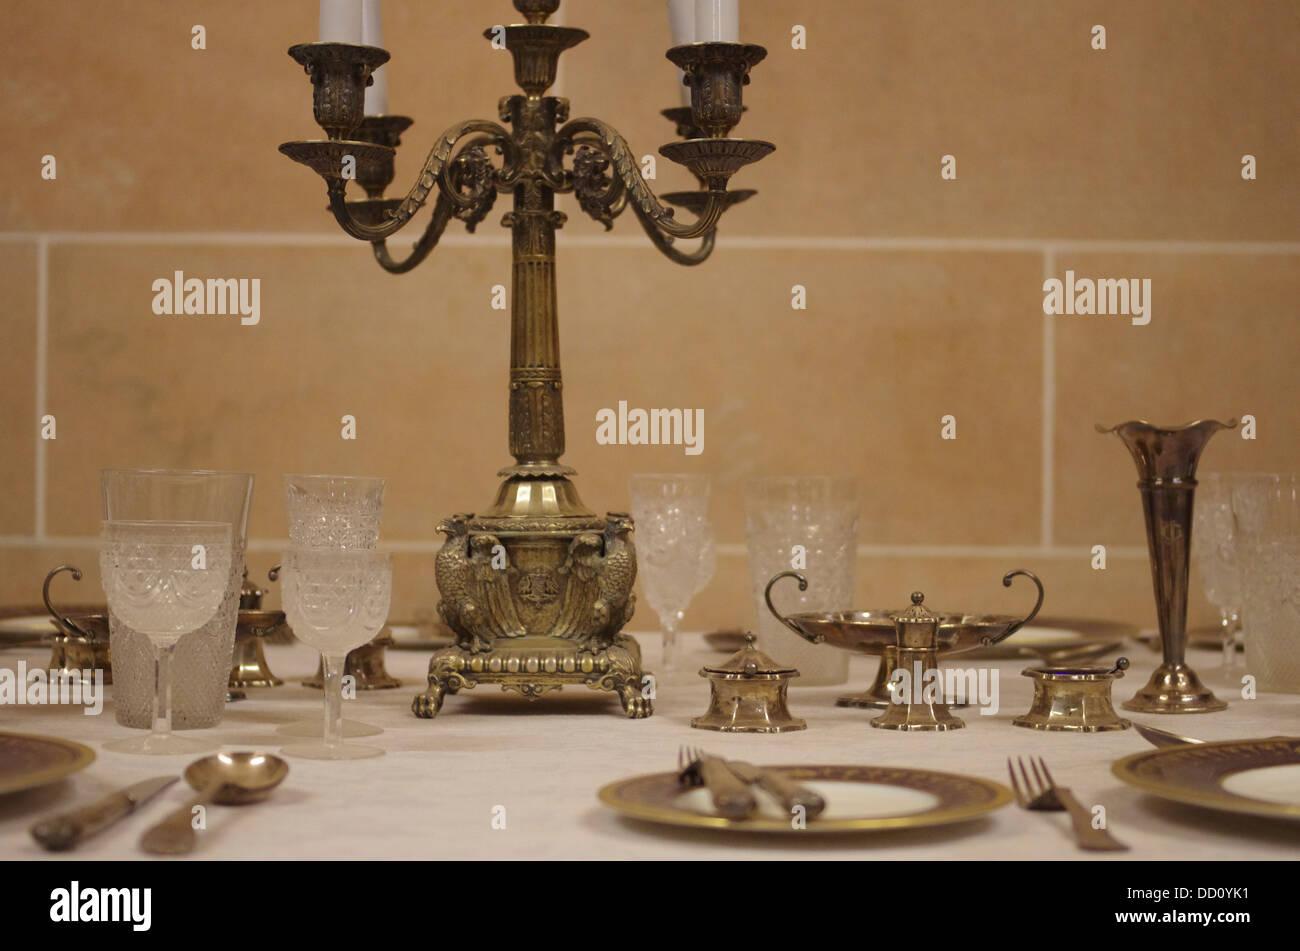 Luxurious table setting at Umaid Bhawan Palace - Jodhpur, Rajashtan, India - Stock Image